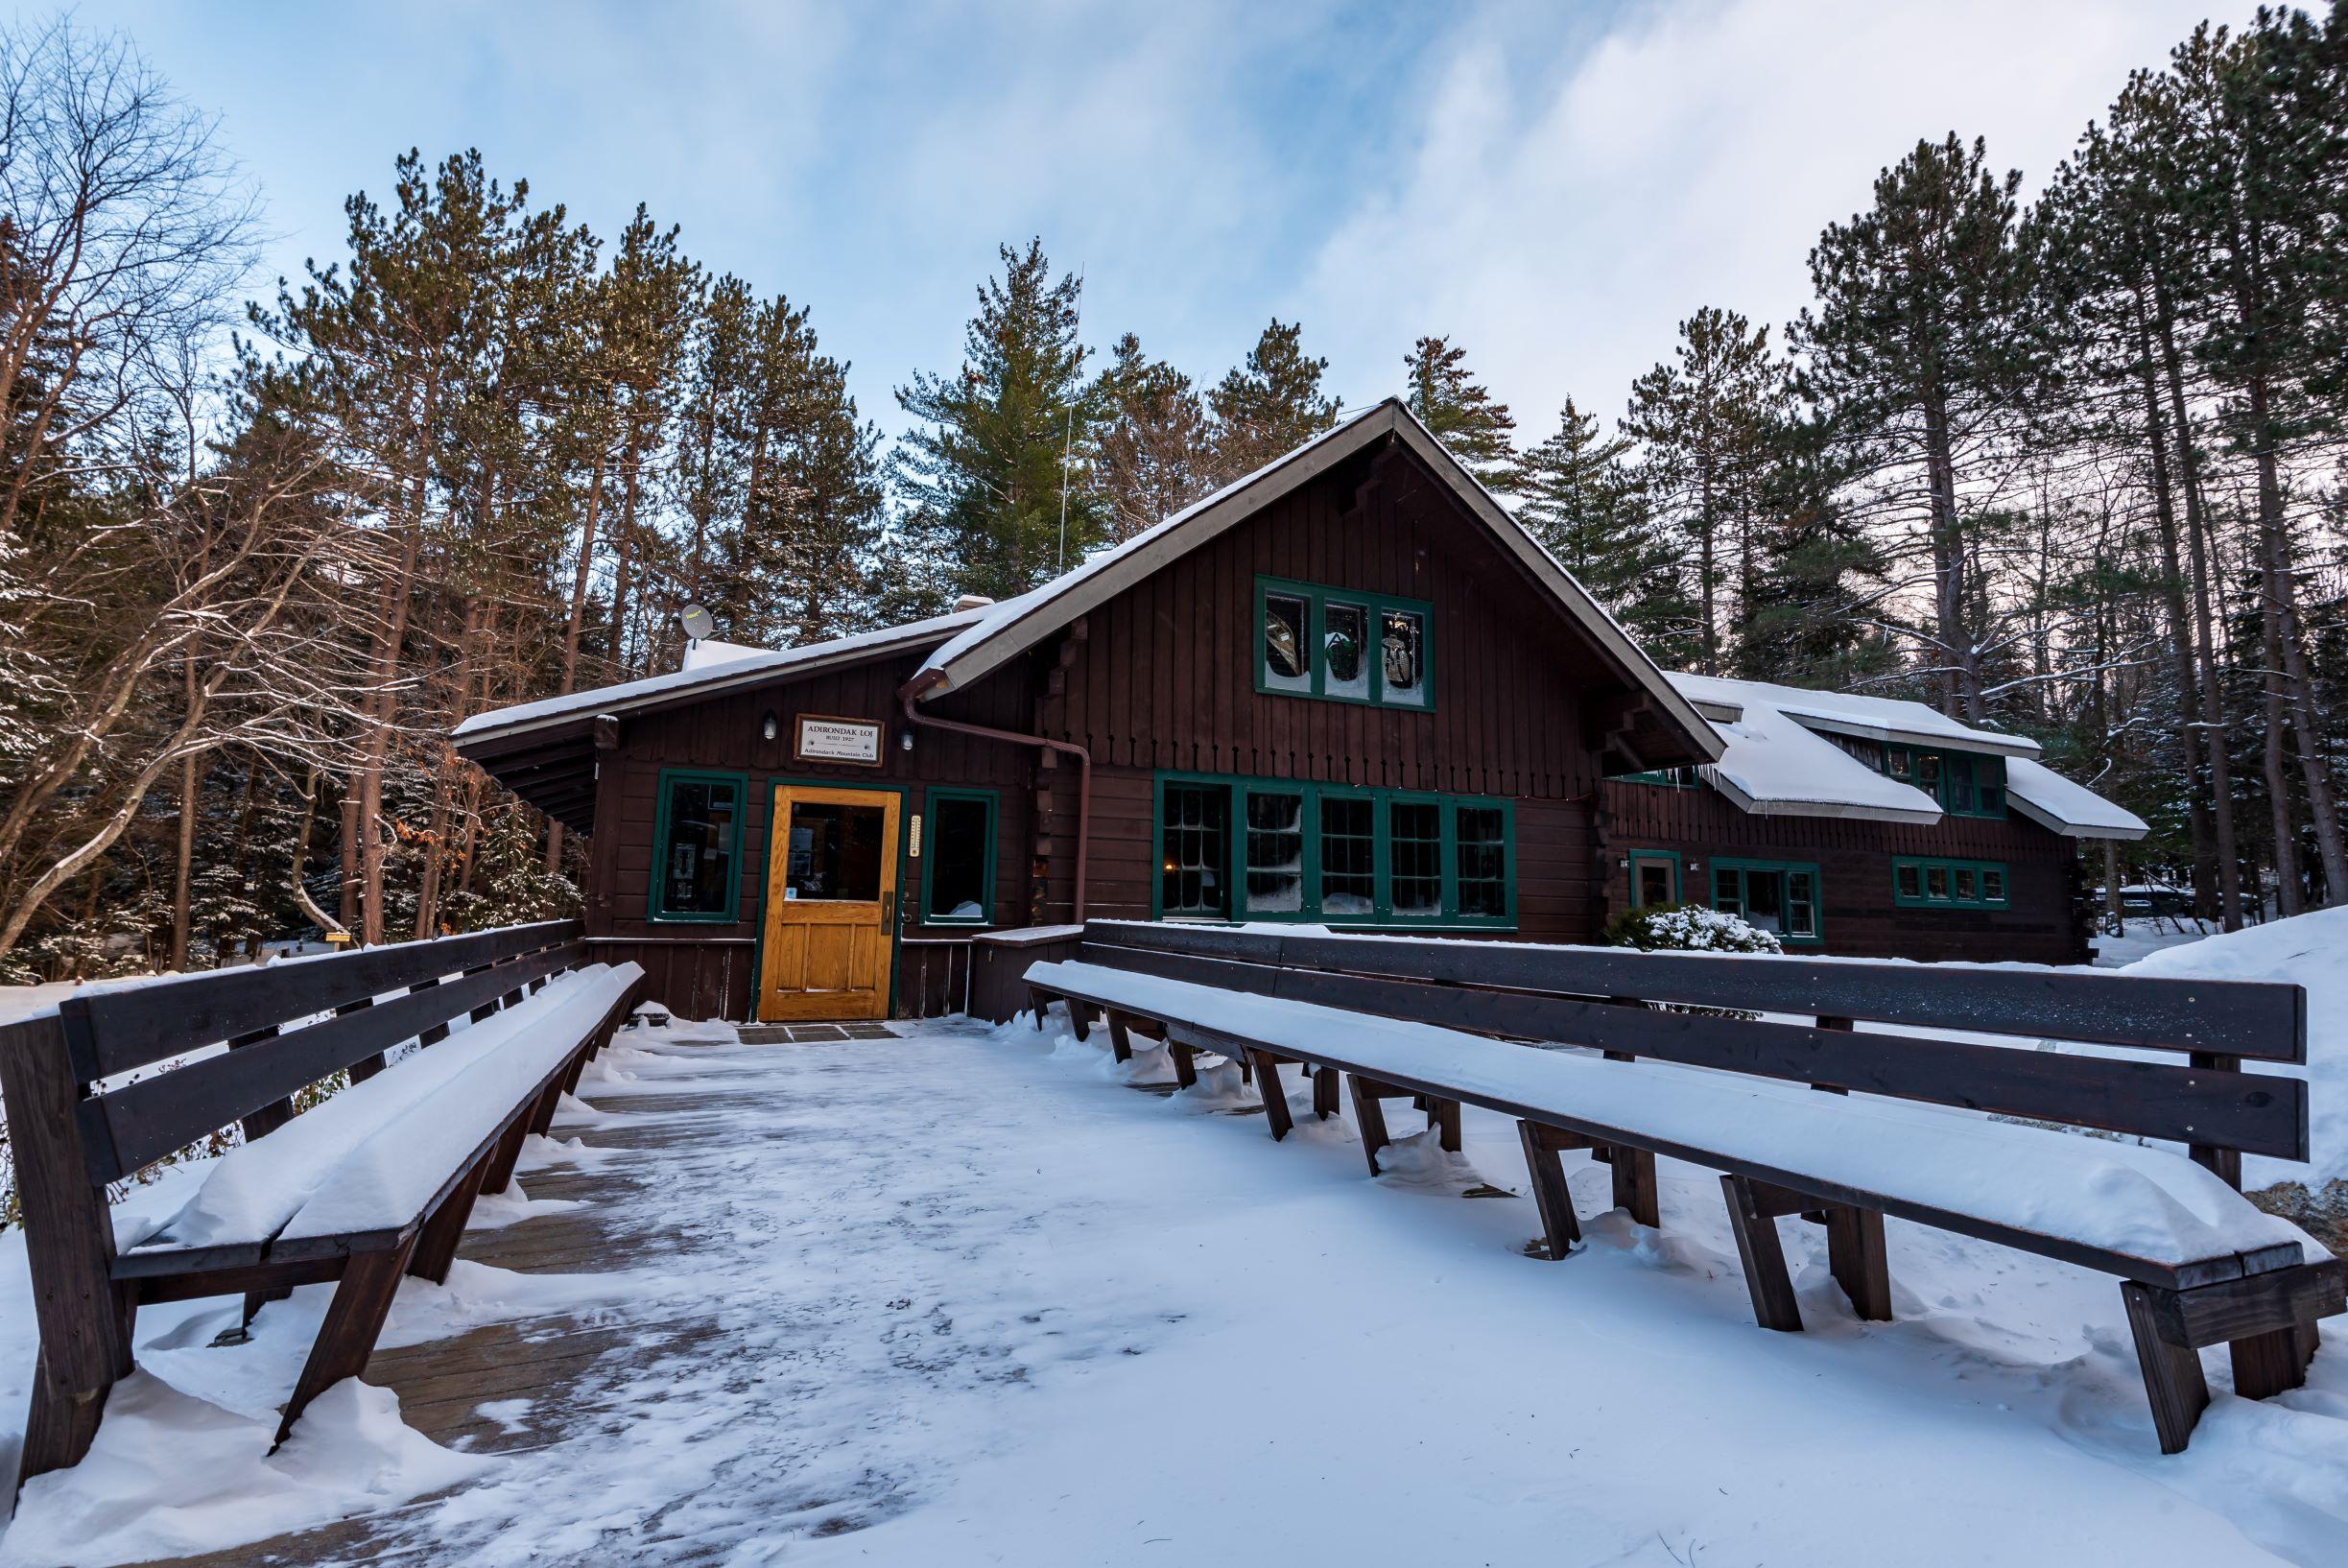 Adirondak Loj exterior in winter